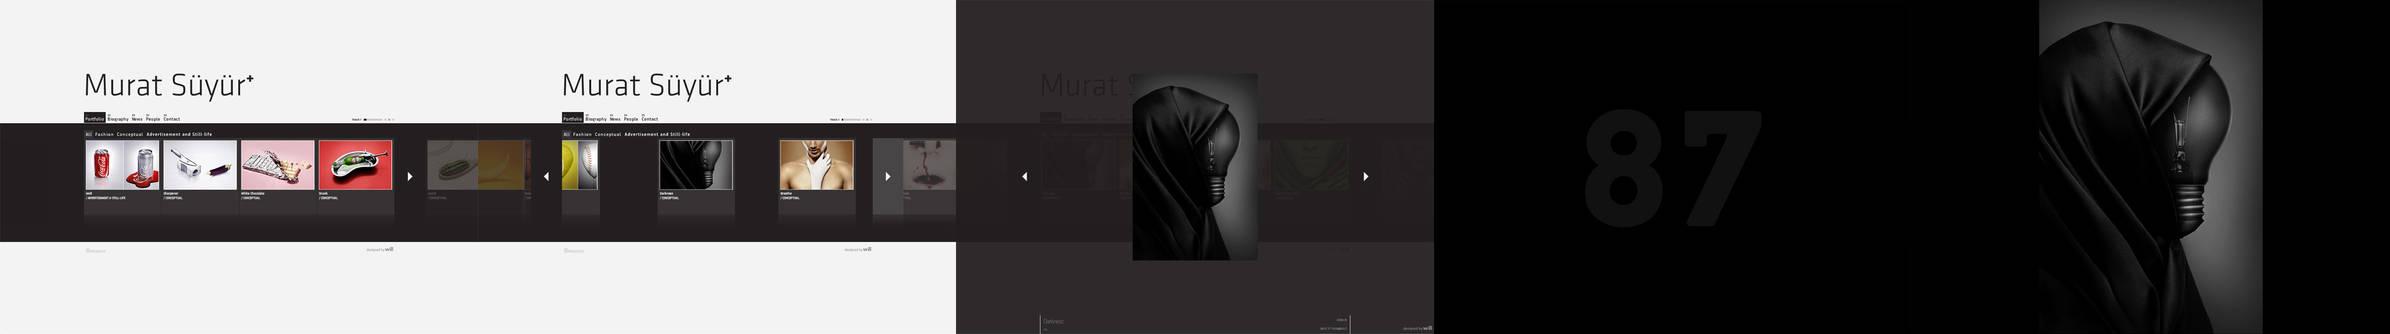 muratsuyur.com